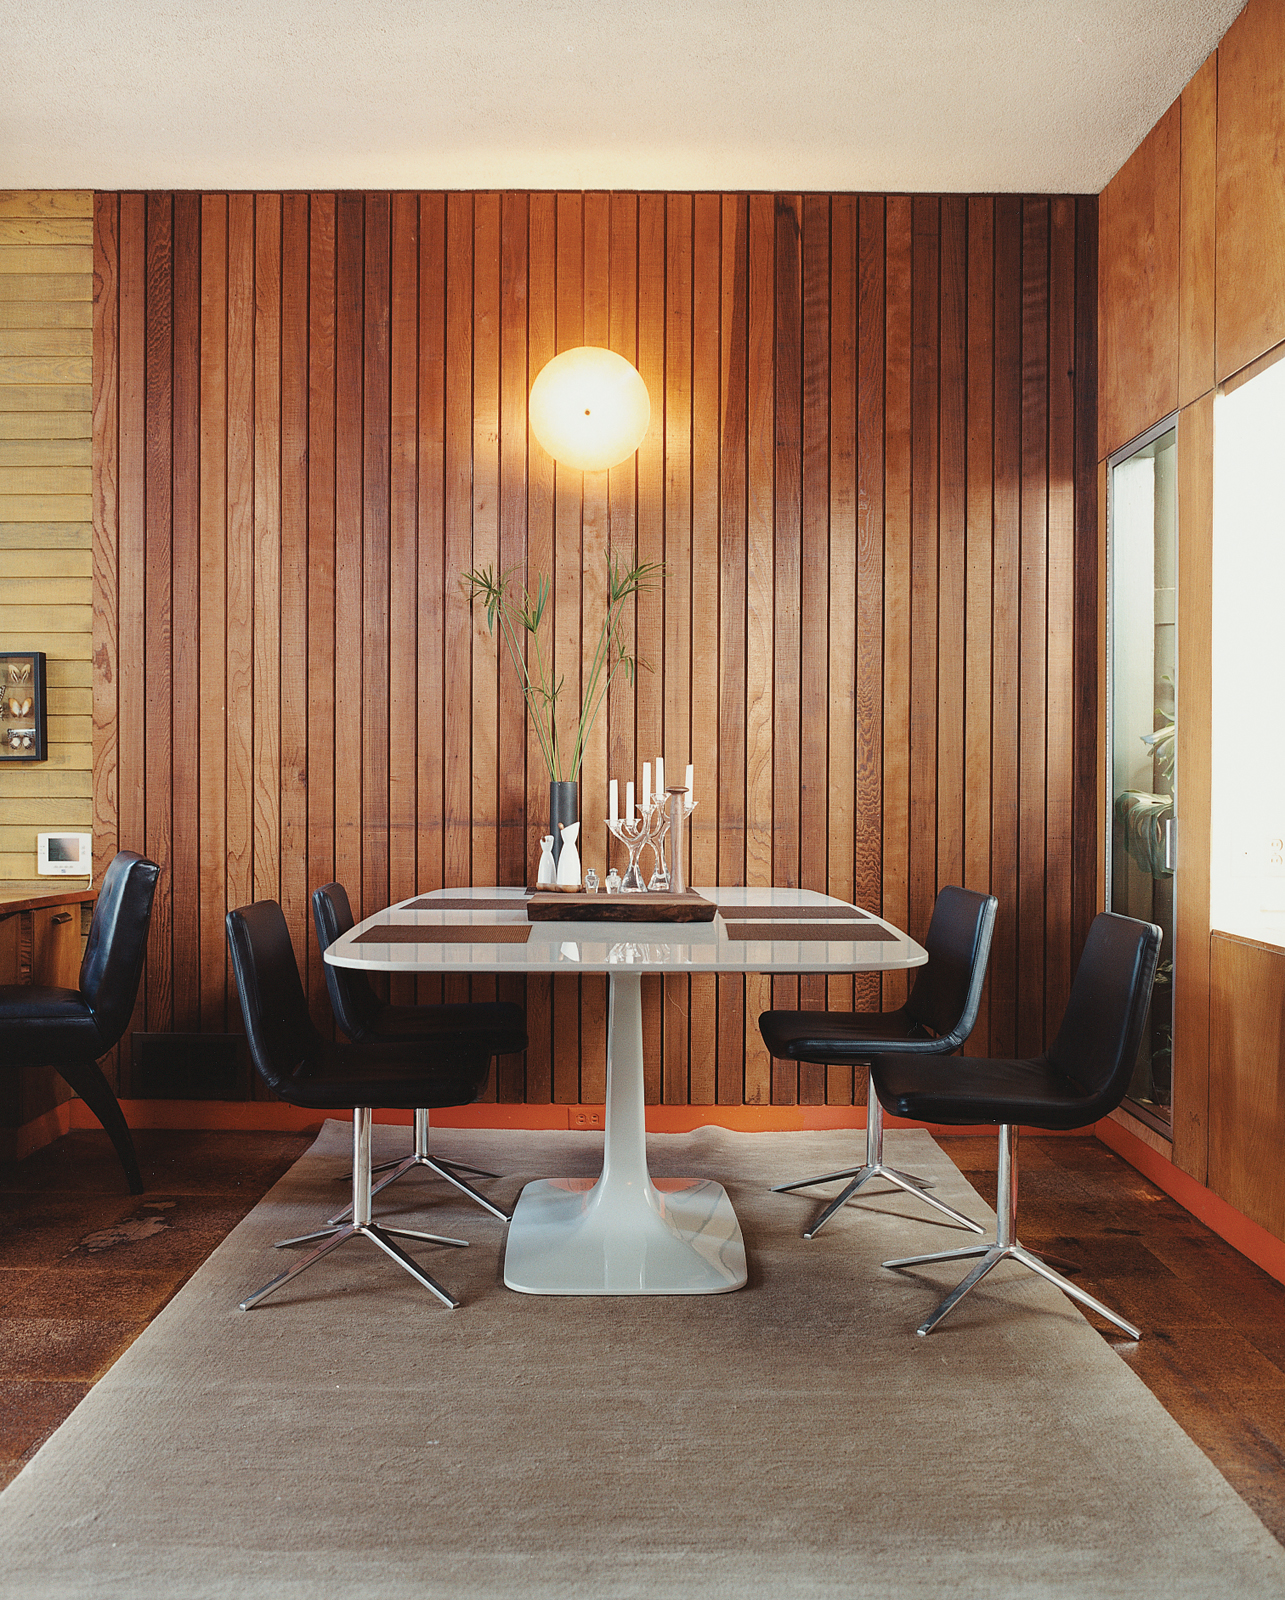 Farnham Rice House Dining Room